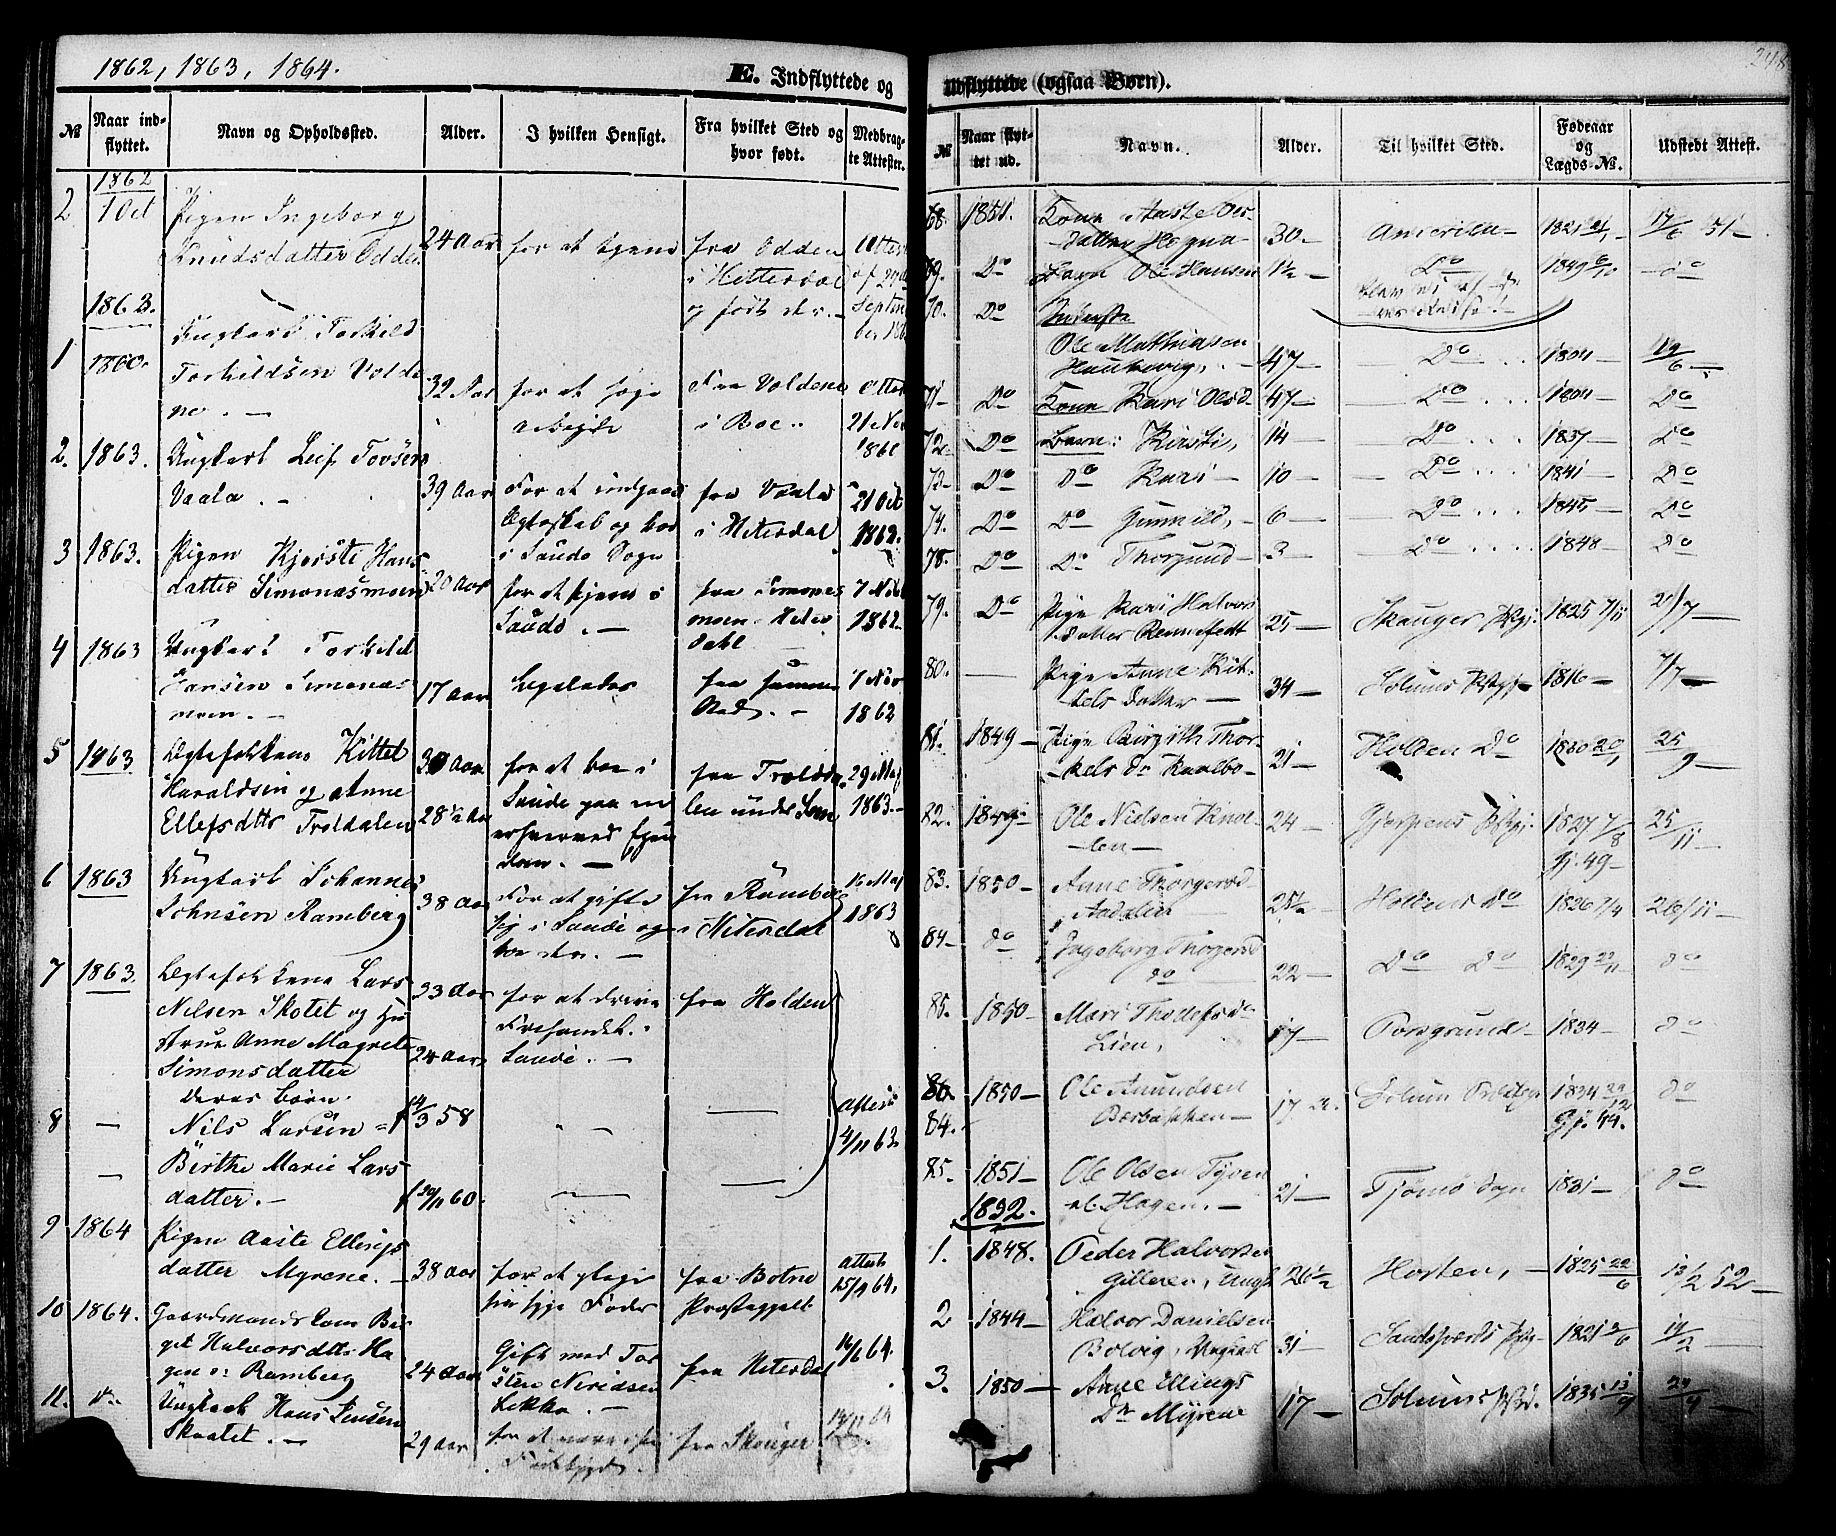 SAKO, Sauherad kirkebøker, F/Fa/L0007: Ministerialbok nr. I 7, 1851-1873, s. 248